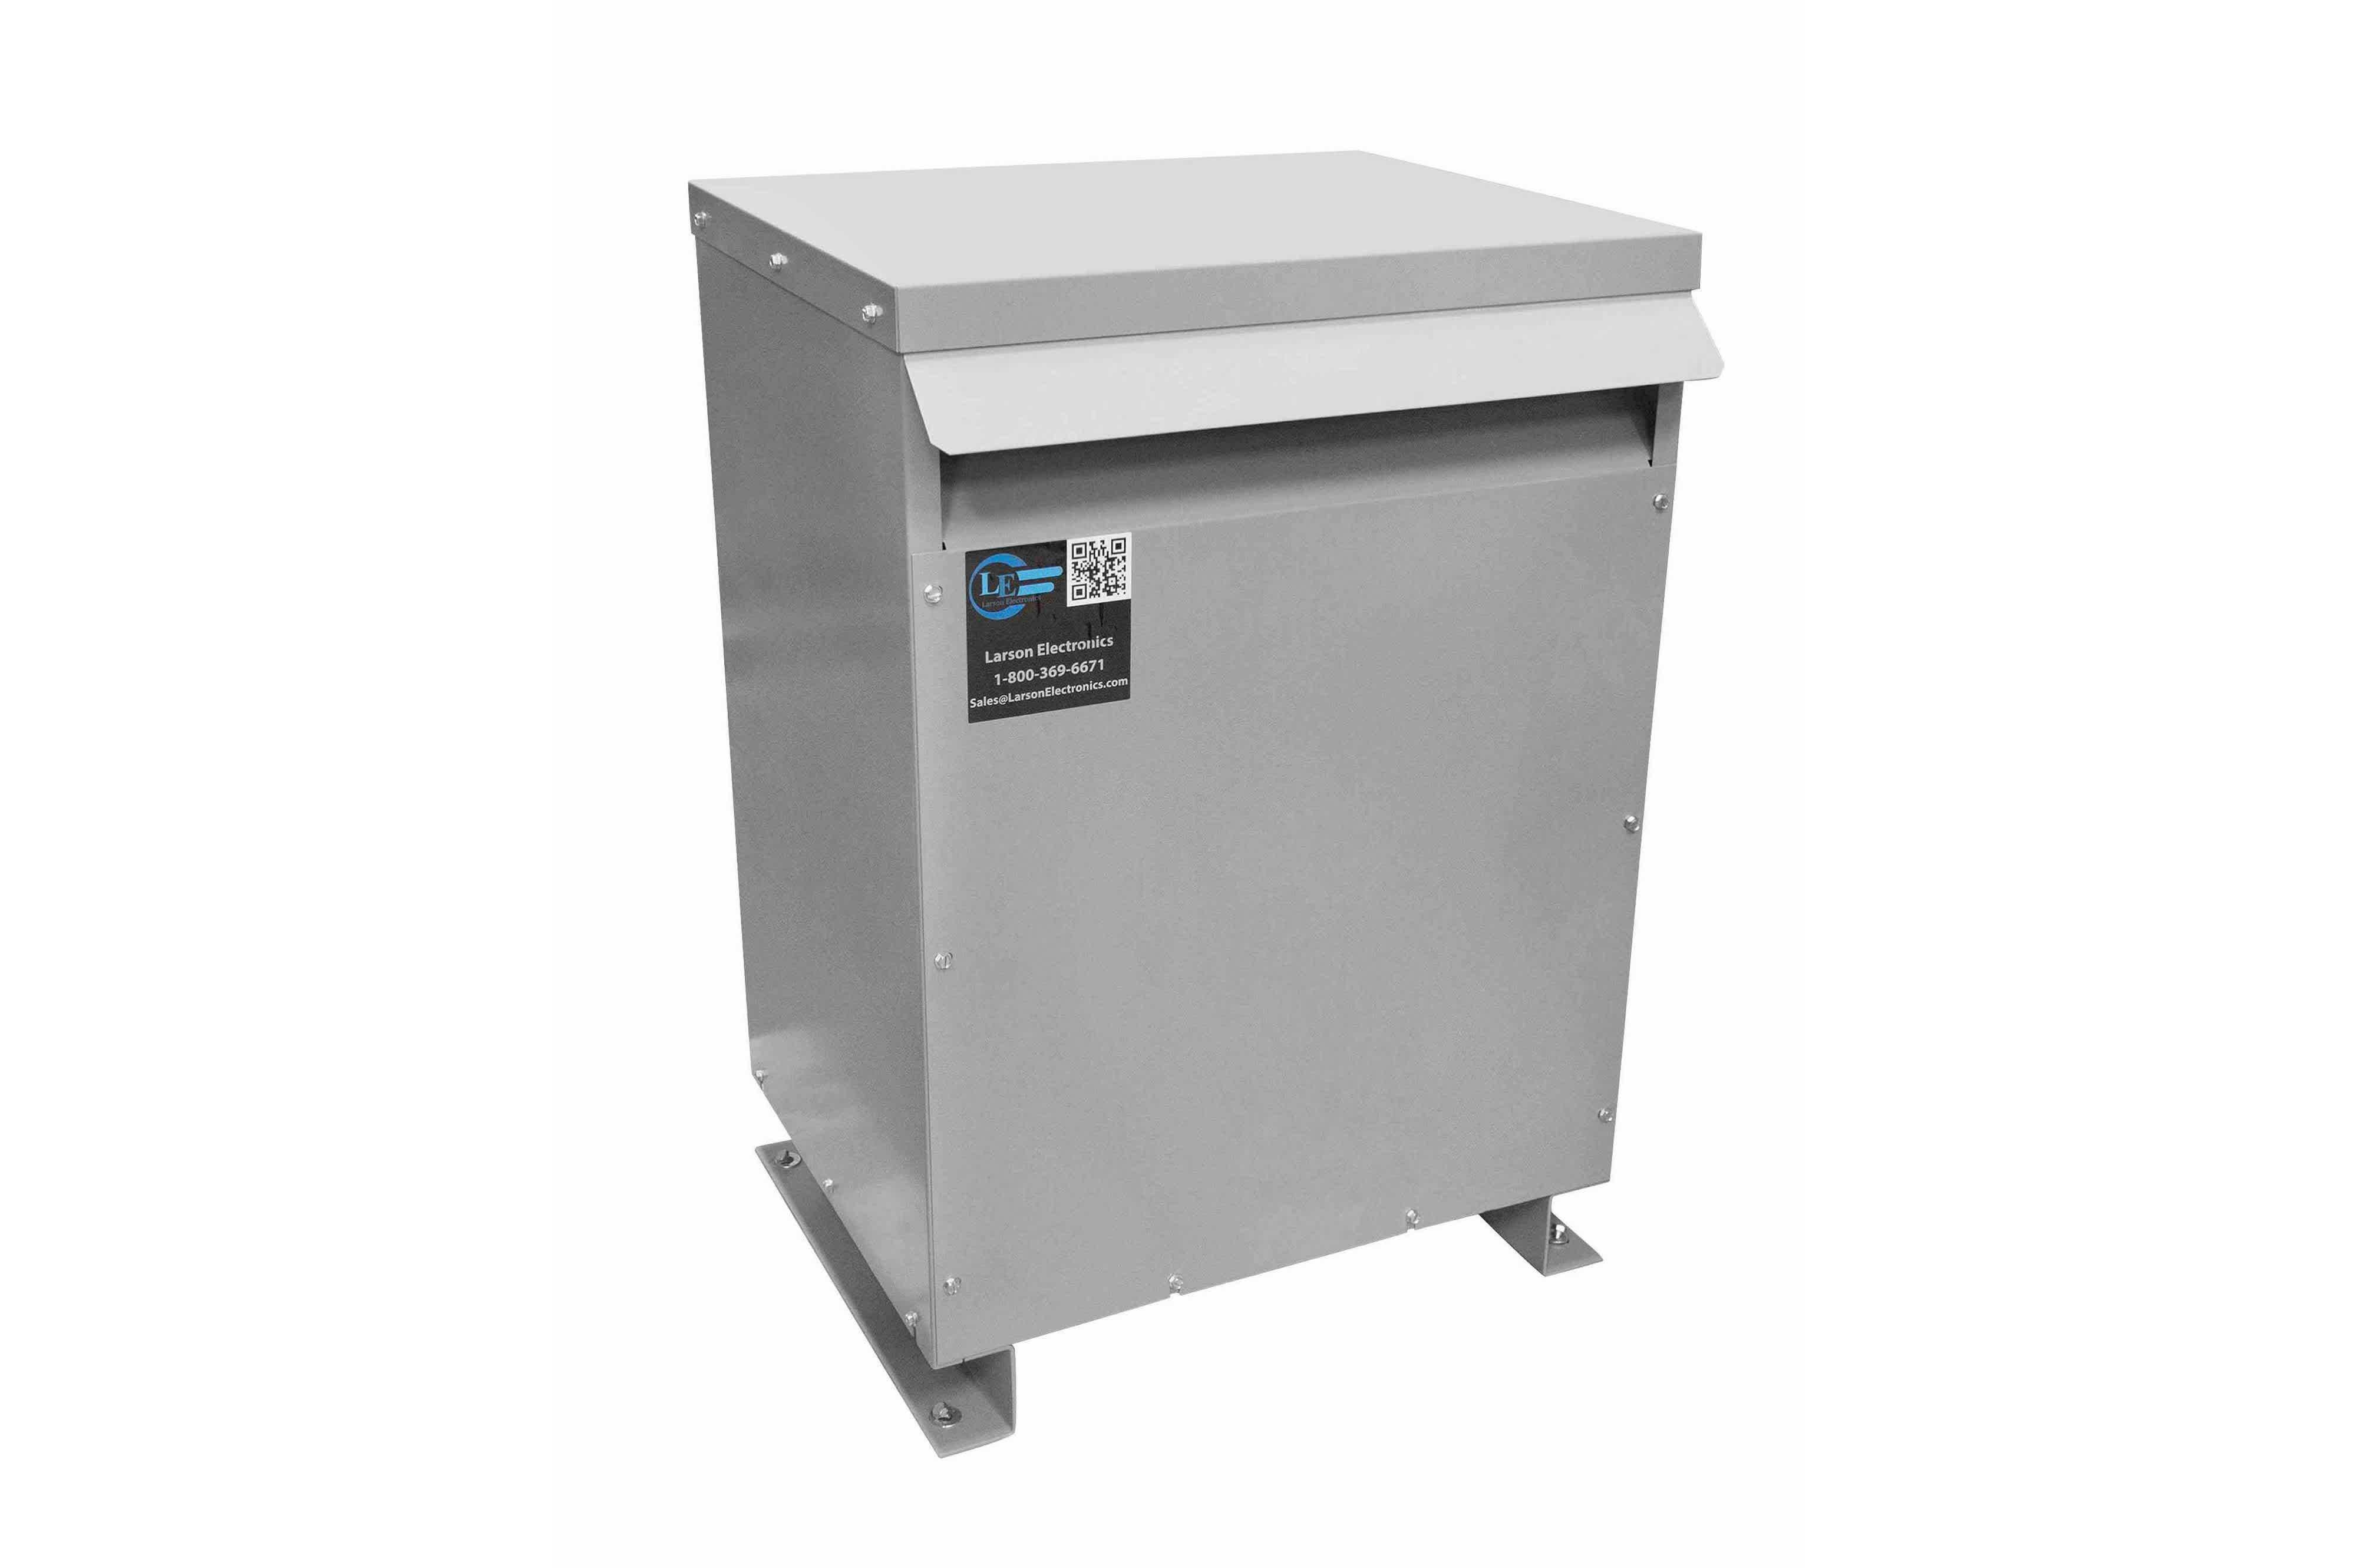 750 kVA 3PH Isolation Transformer, 380V Wye Primary, 240V/120 Delta Secondary, N3R, Ventilated, 60 Hz